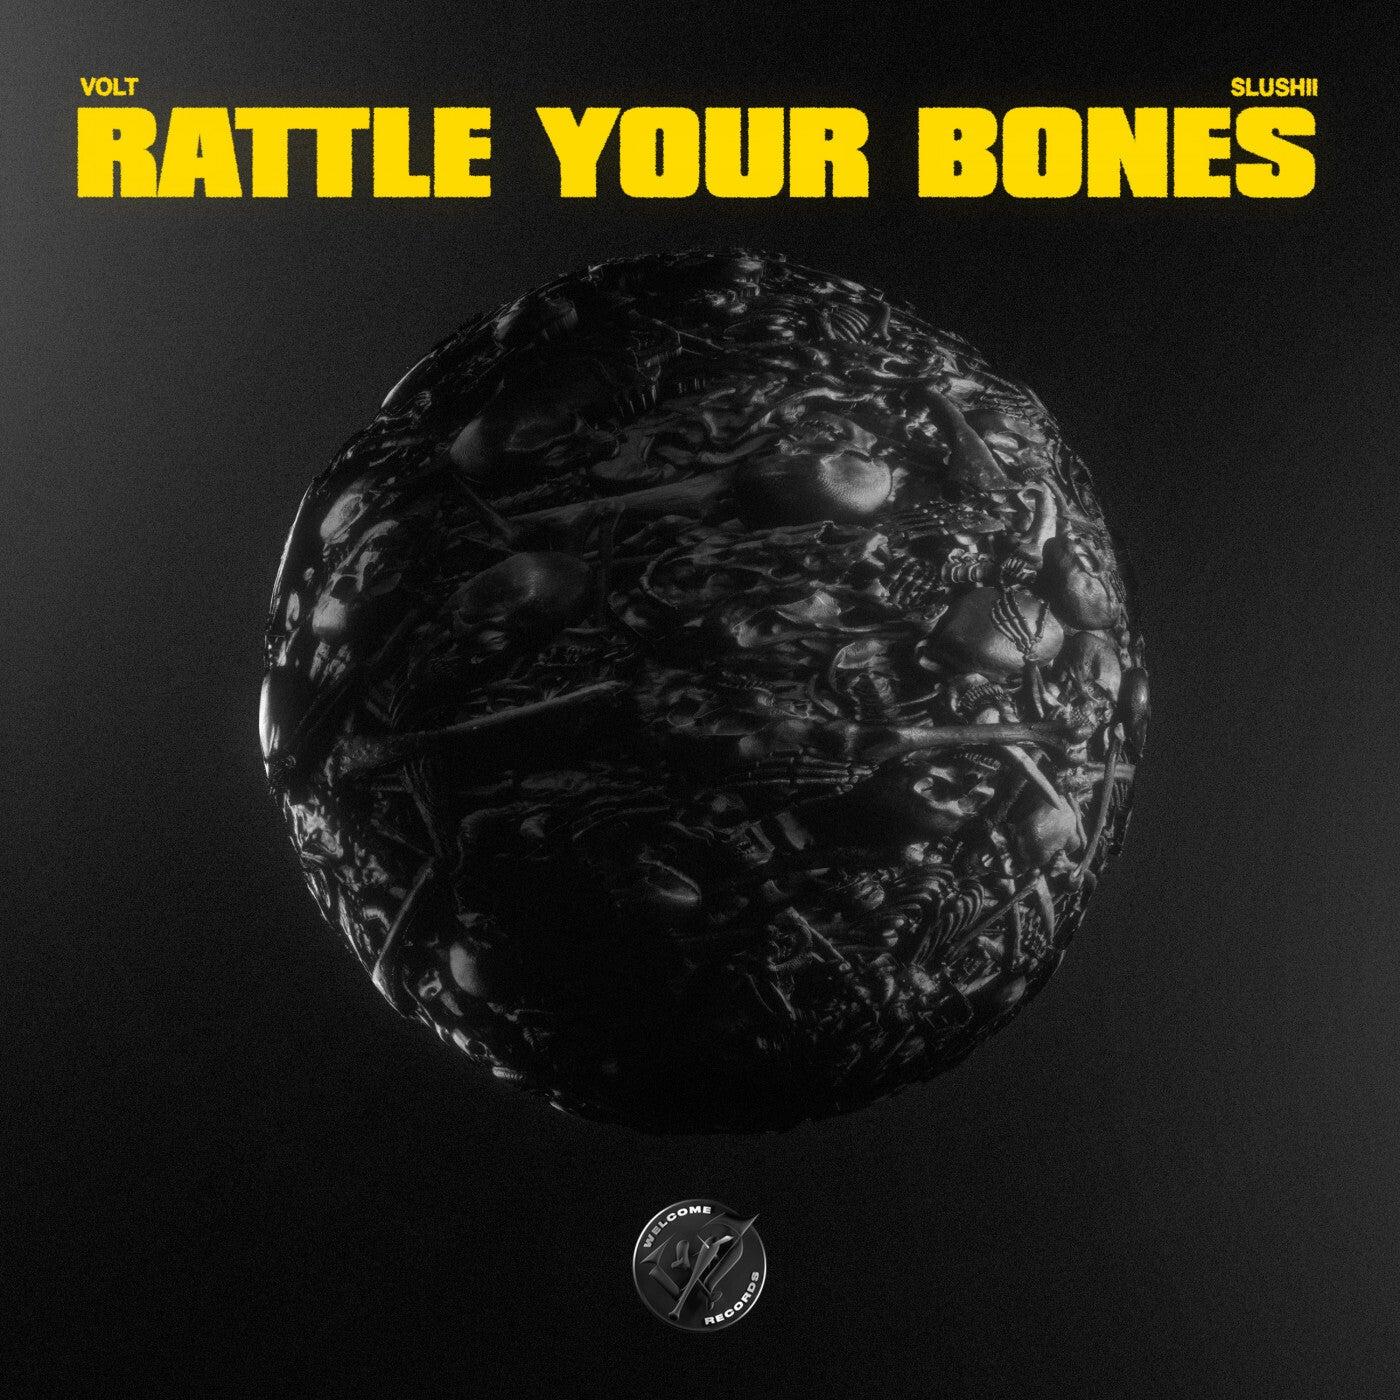 Rattle Your Bones (Original Mix)